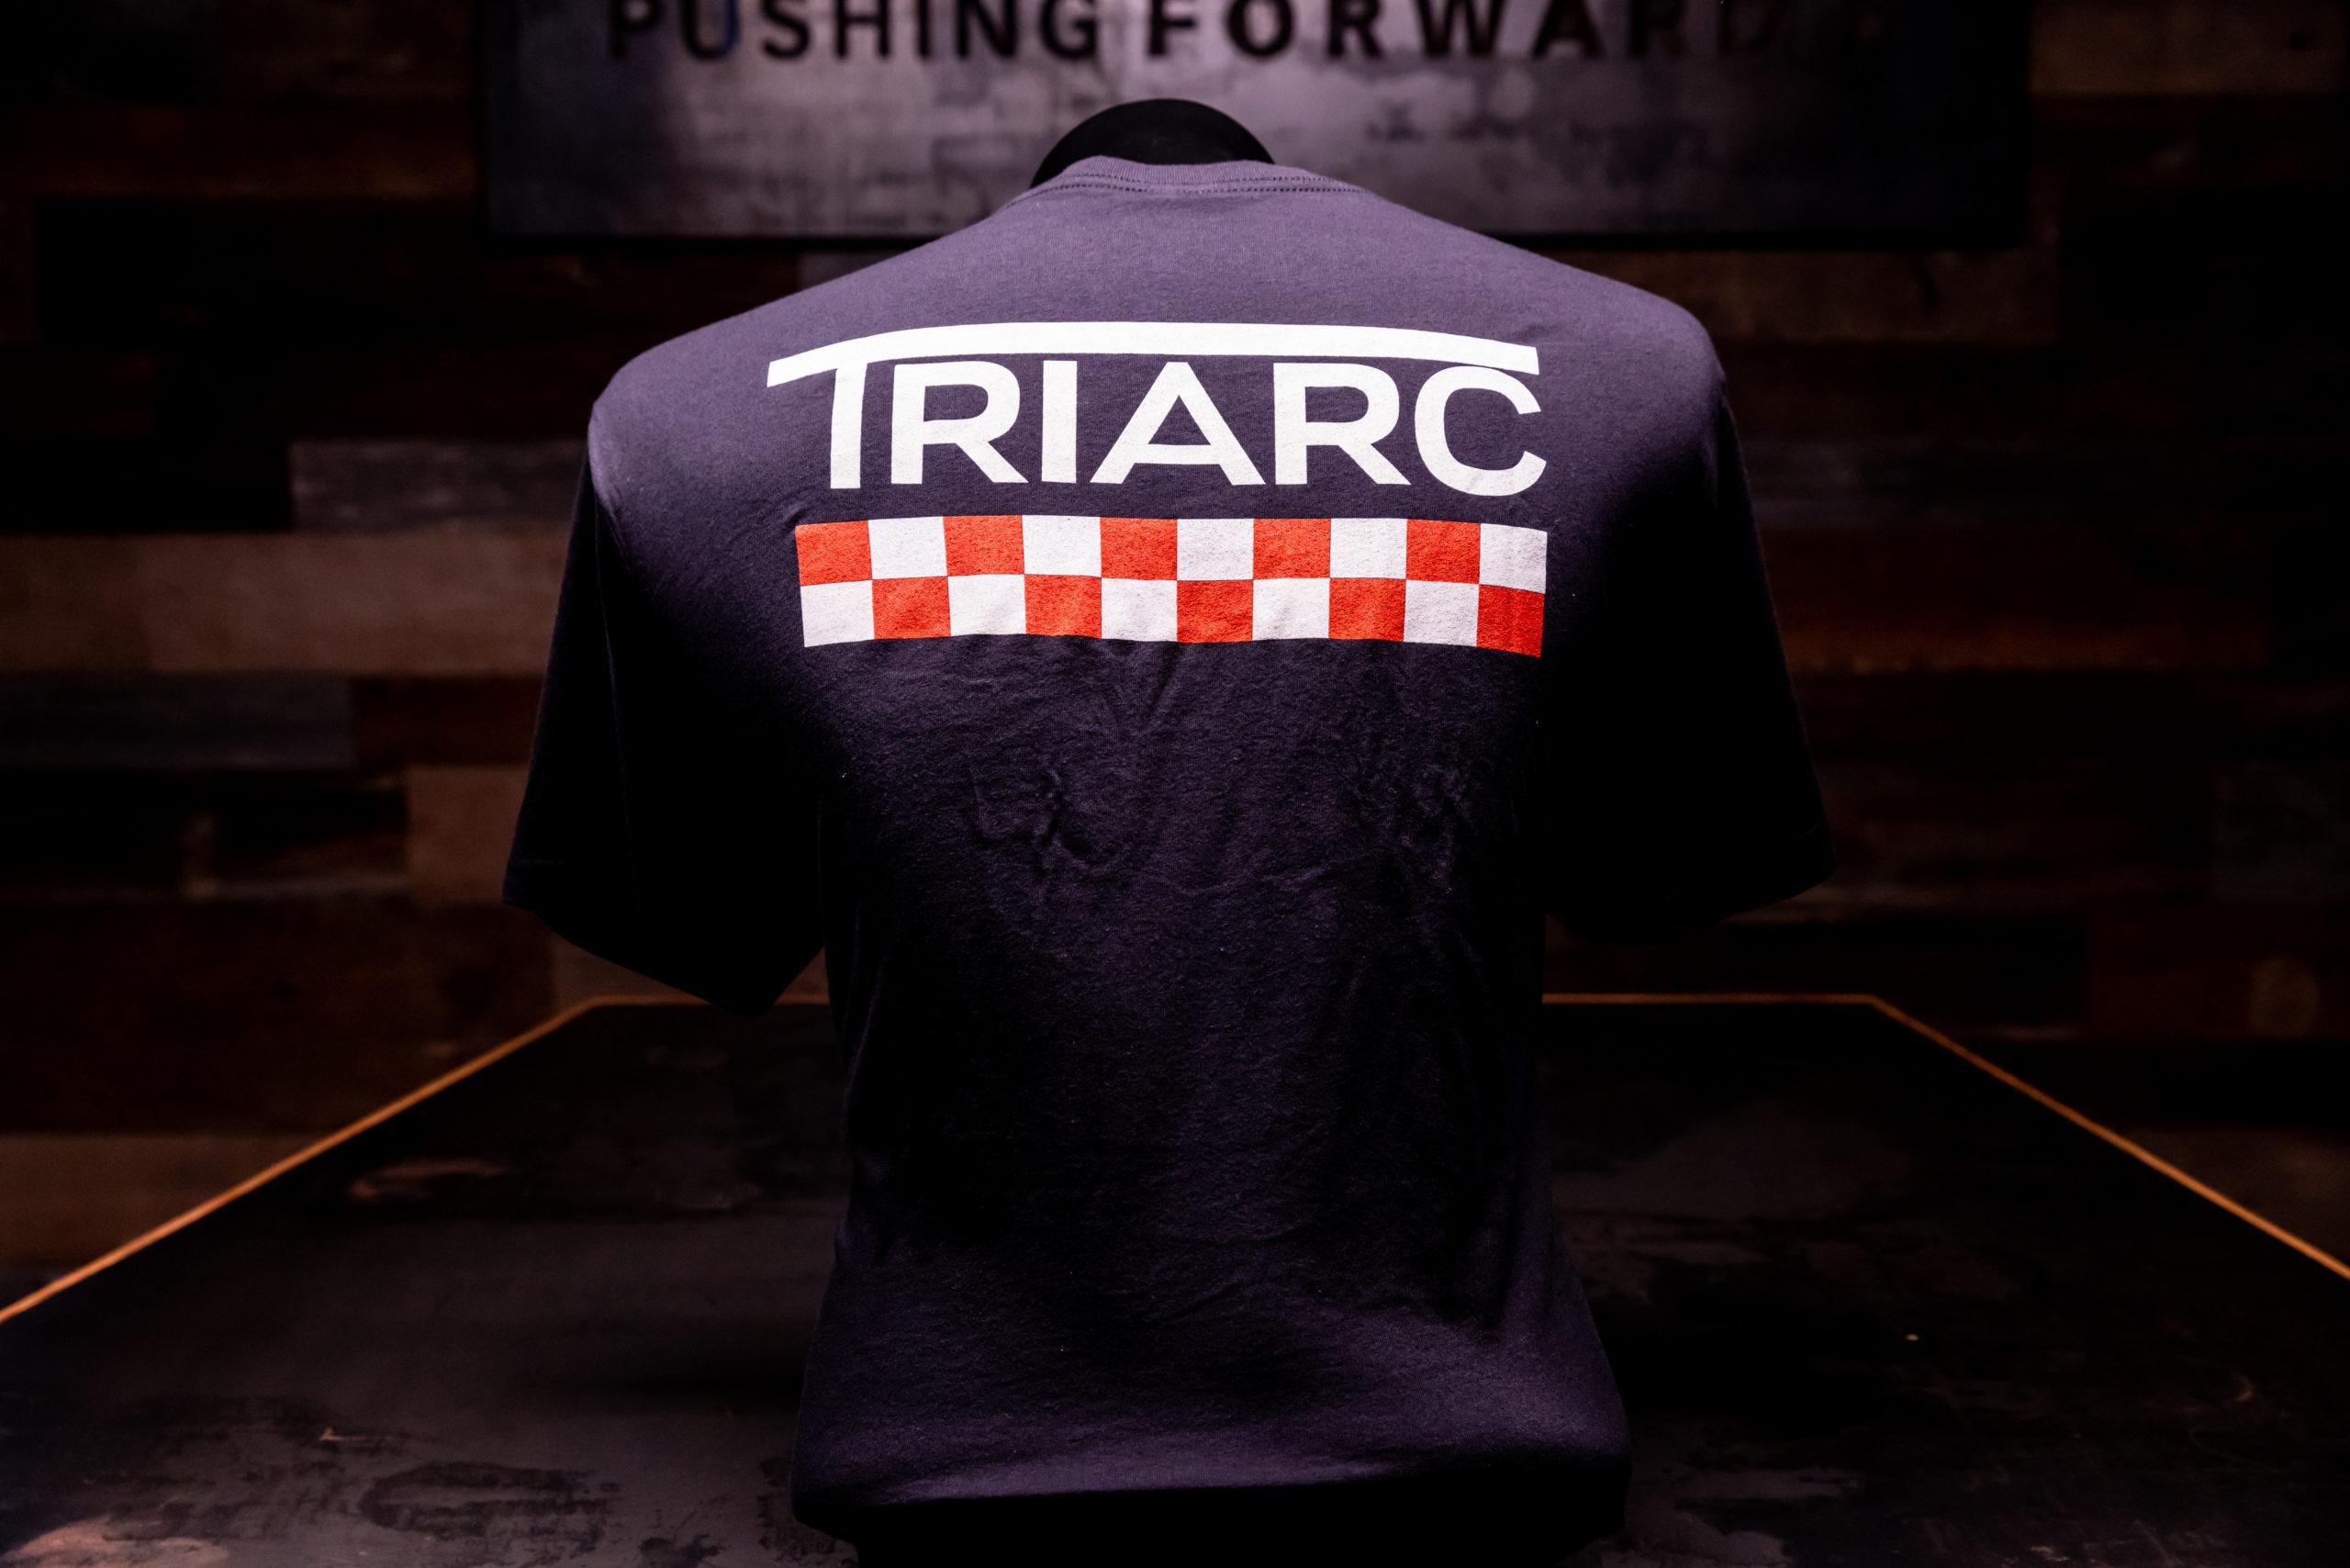 TRIARC Systems – Vans T-Shirt